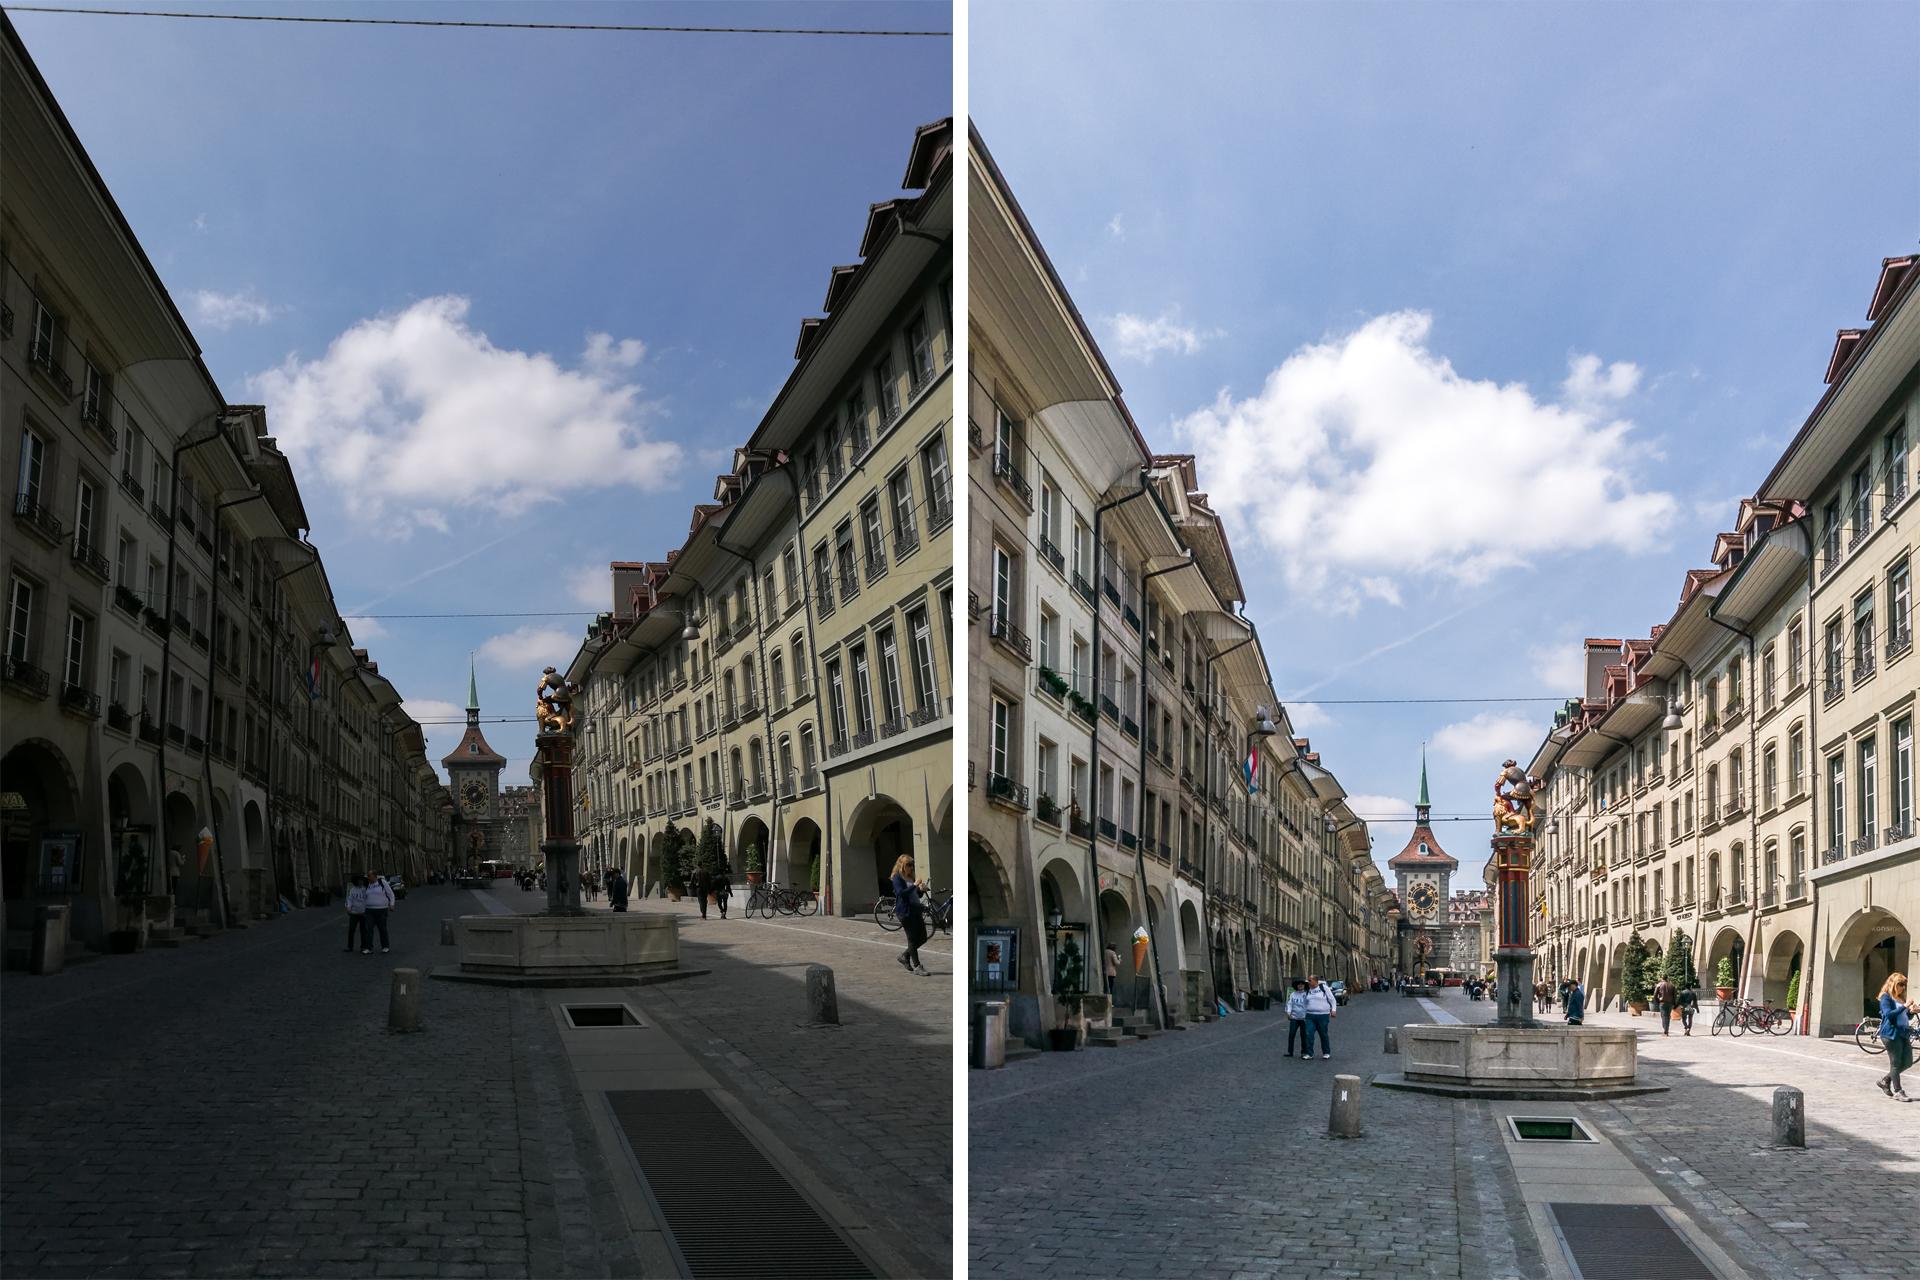 Huawei-p9-Testbild-Bern-Altstadt-vergleich